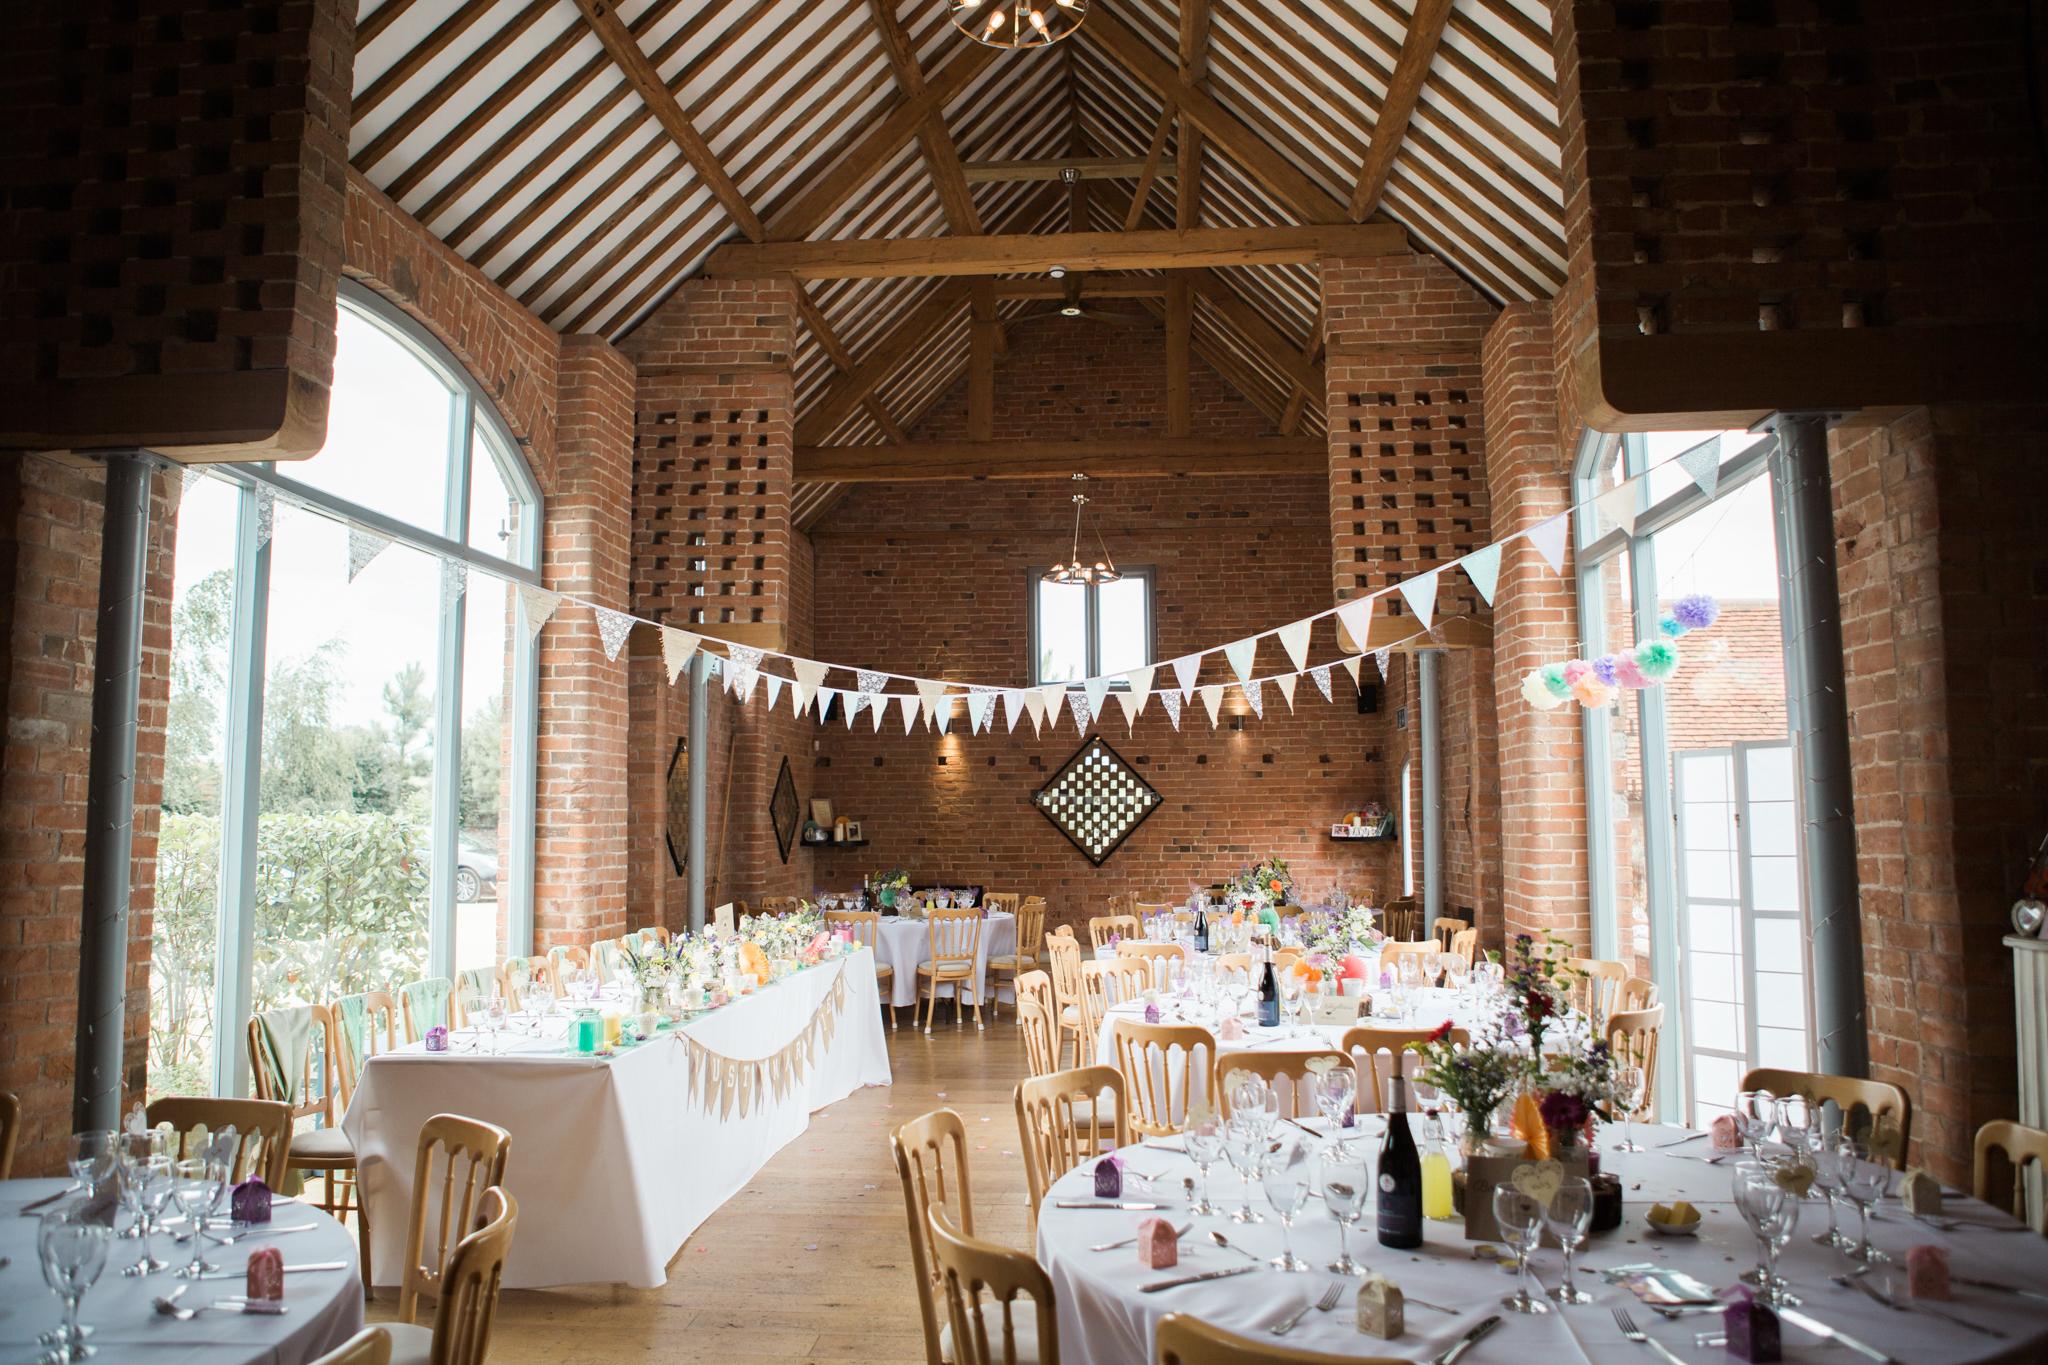 Rowsie & Lee, Swallows Nest Barn Wedding, Cotswold wedding photographer, Warwickshire Wedding Photographer-103.jpg